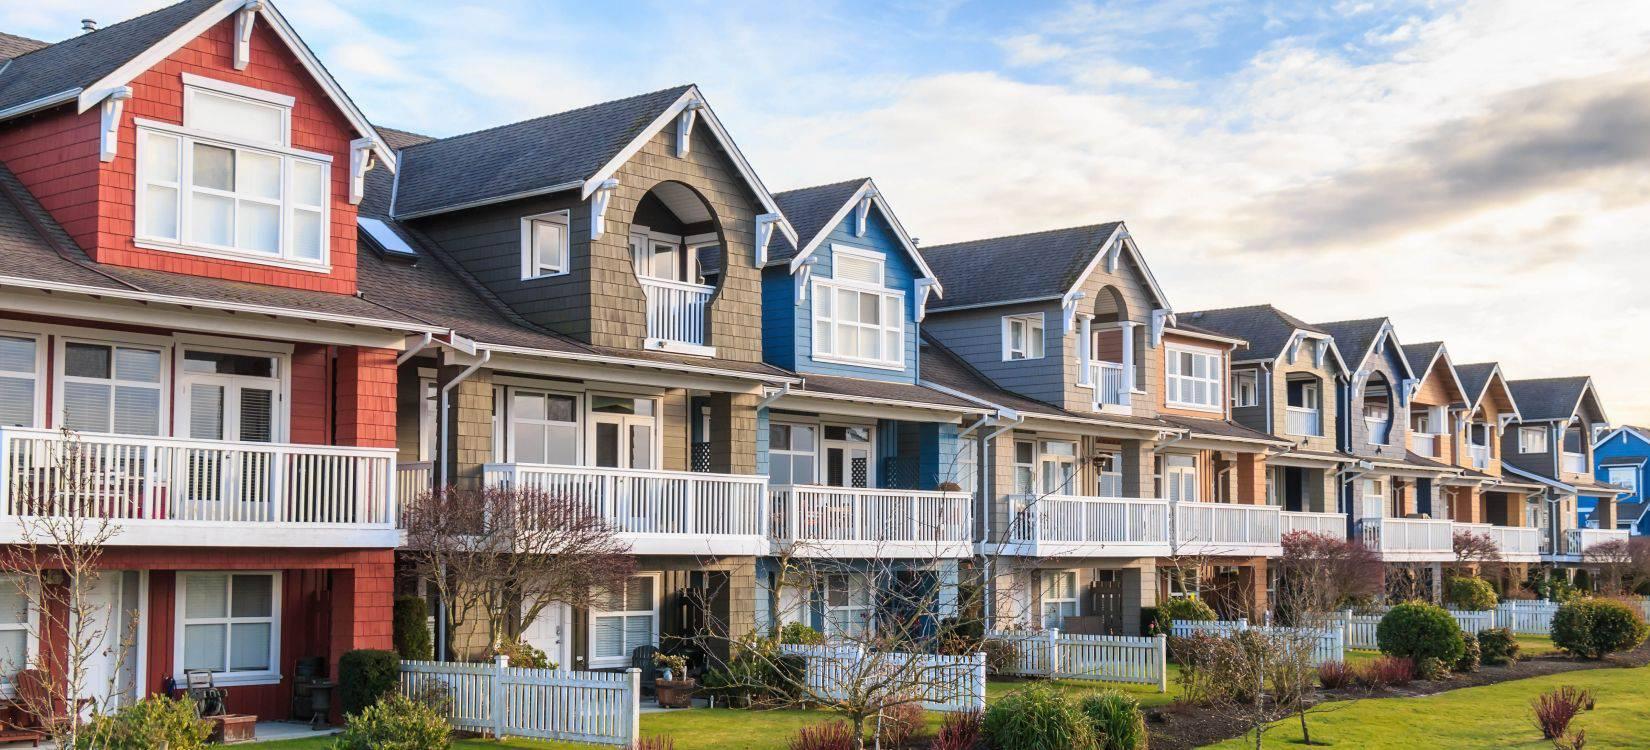 Benjamin Moore: 3 best exterior paint ideas | QualitySmith